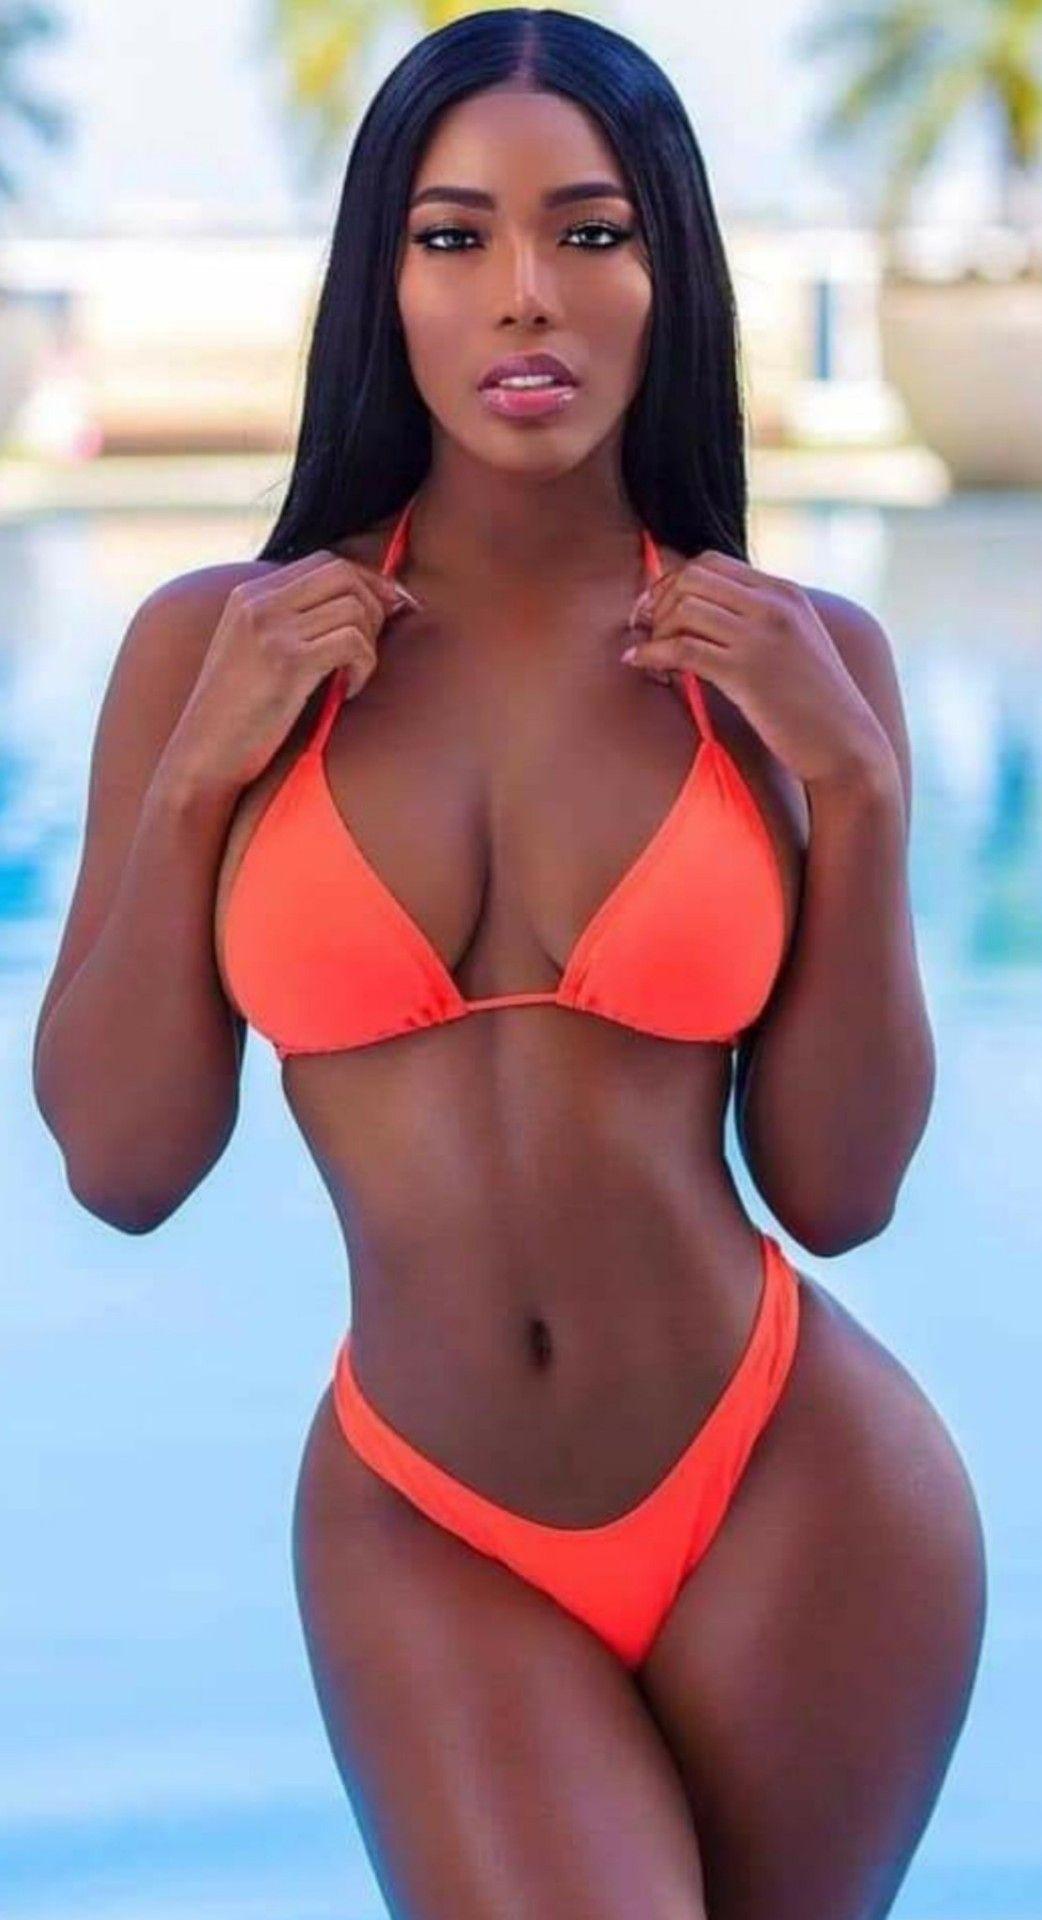 Ebony Girl Bikini